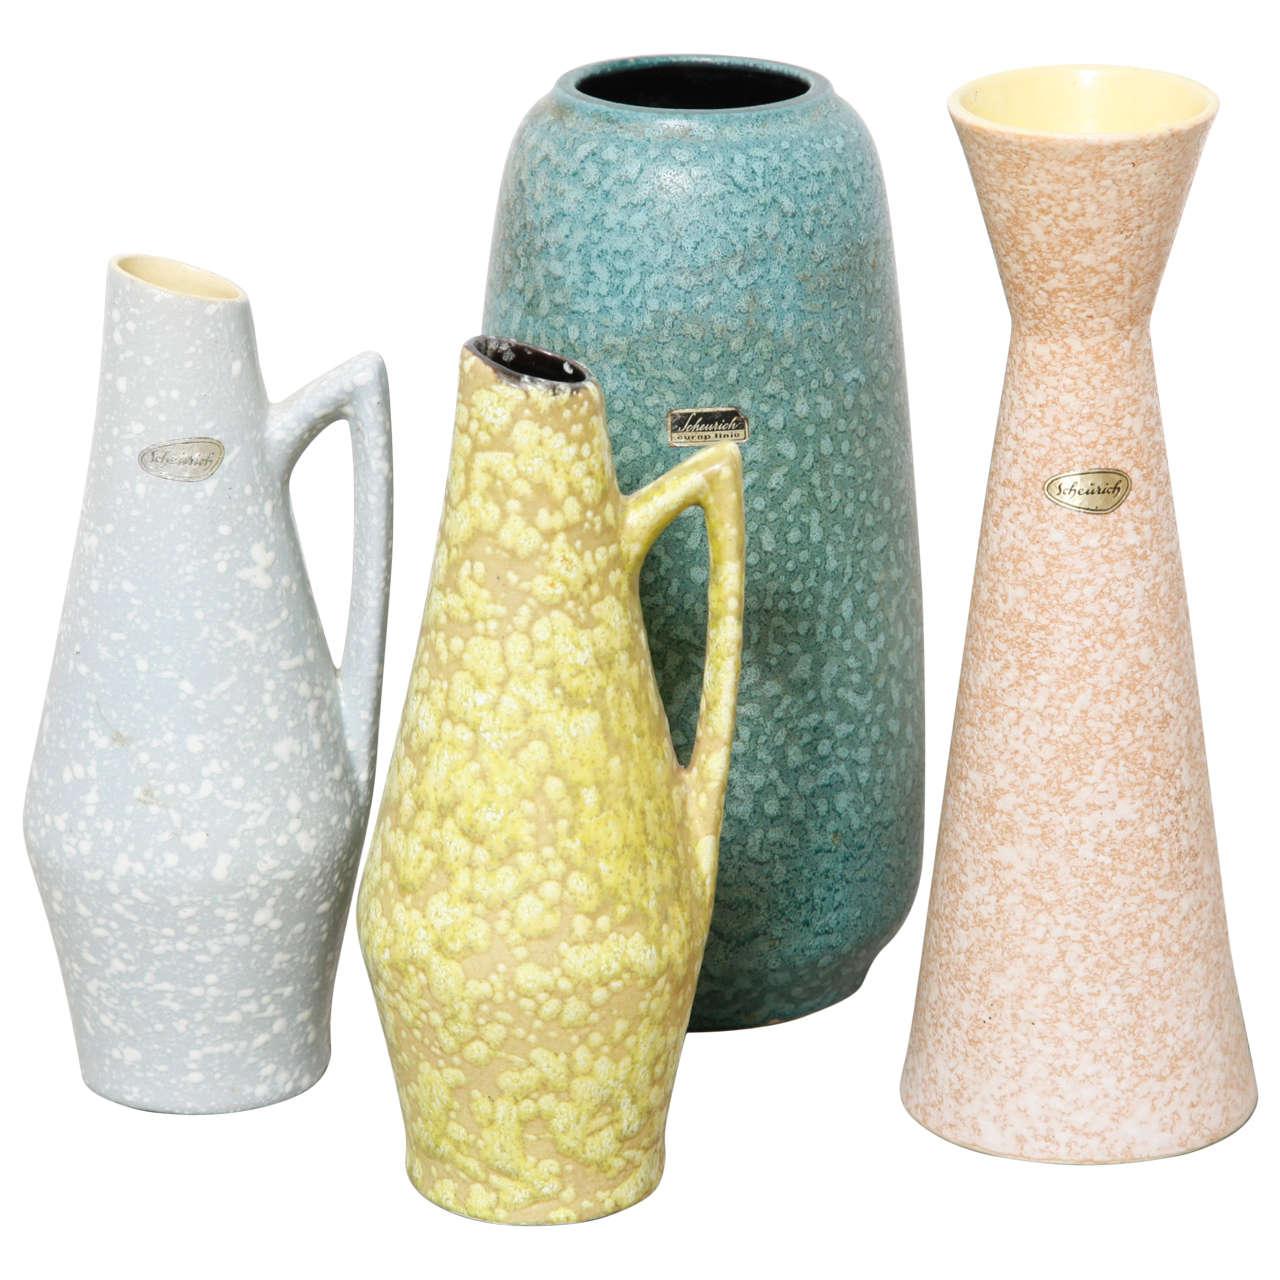 set of modernist scheurich west germany ceramic vases at stdibs - set of modernist scheurich west germany ceramic vases